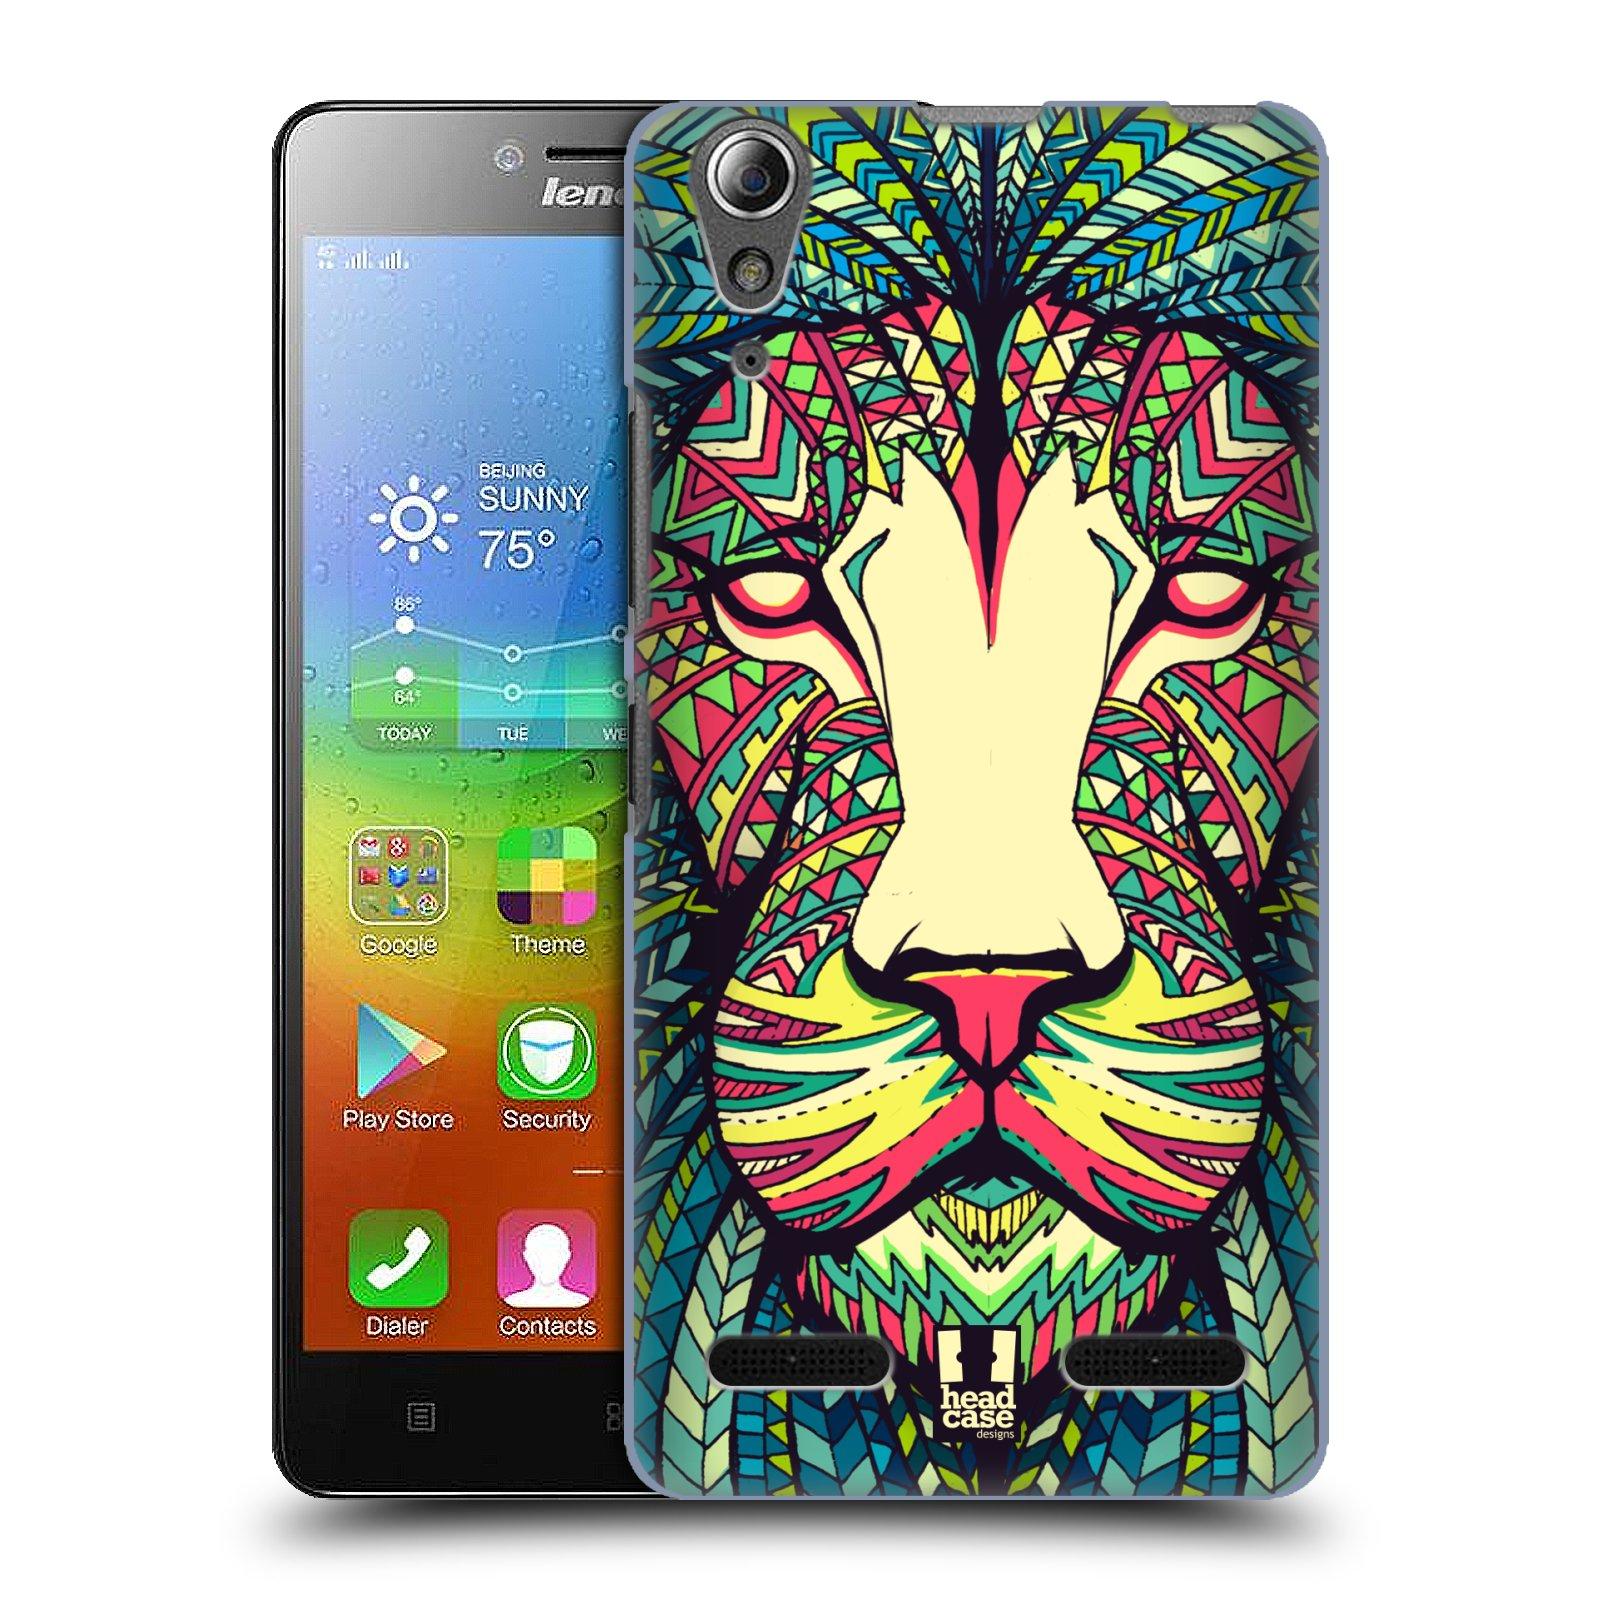 HEAD CASE pevný plastový obal na mobil LENOVO A6000 / A6000 PLUS vzor Aztécký motiv zvíře lev